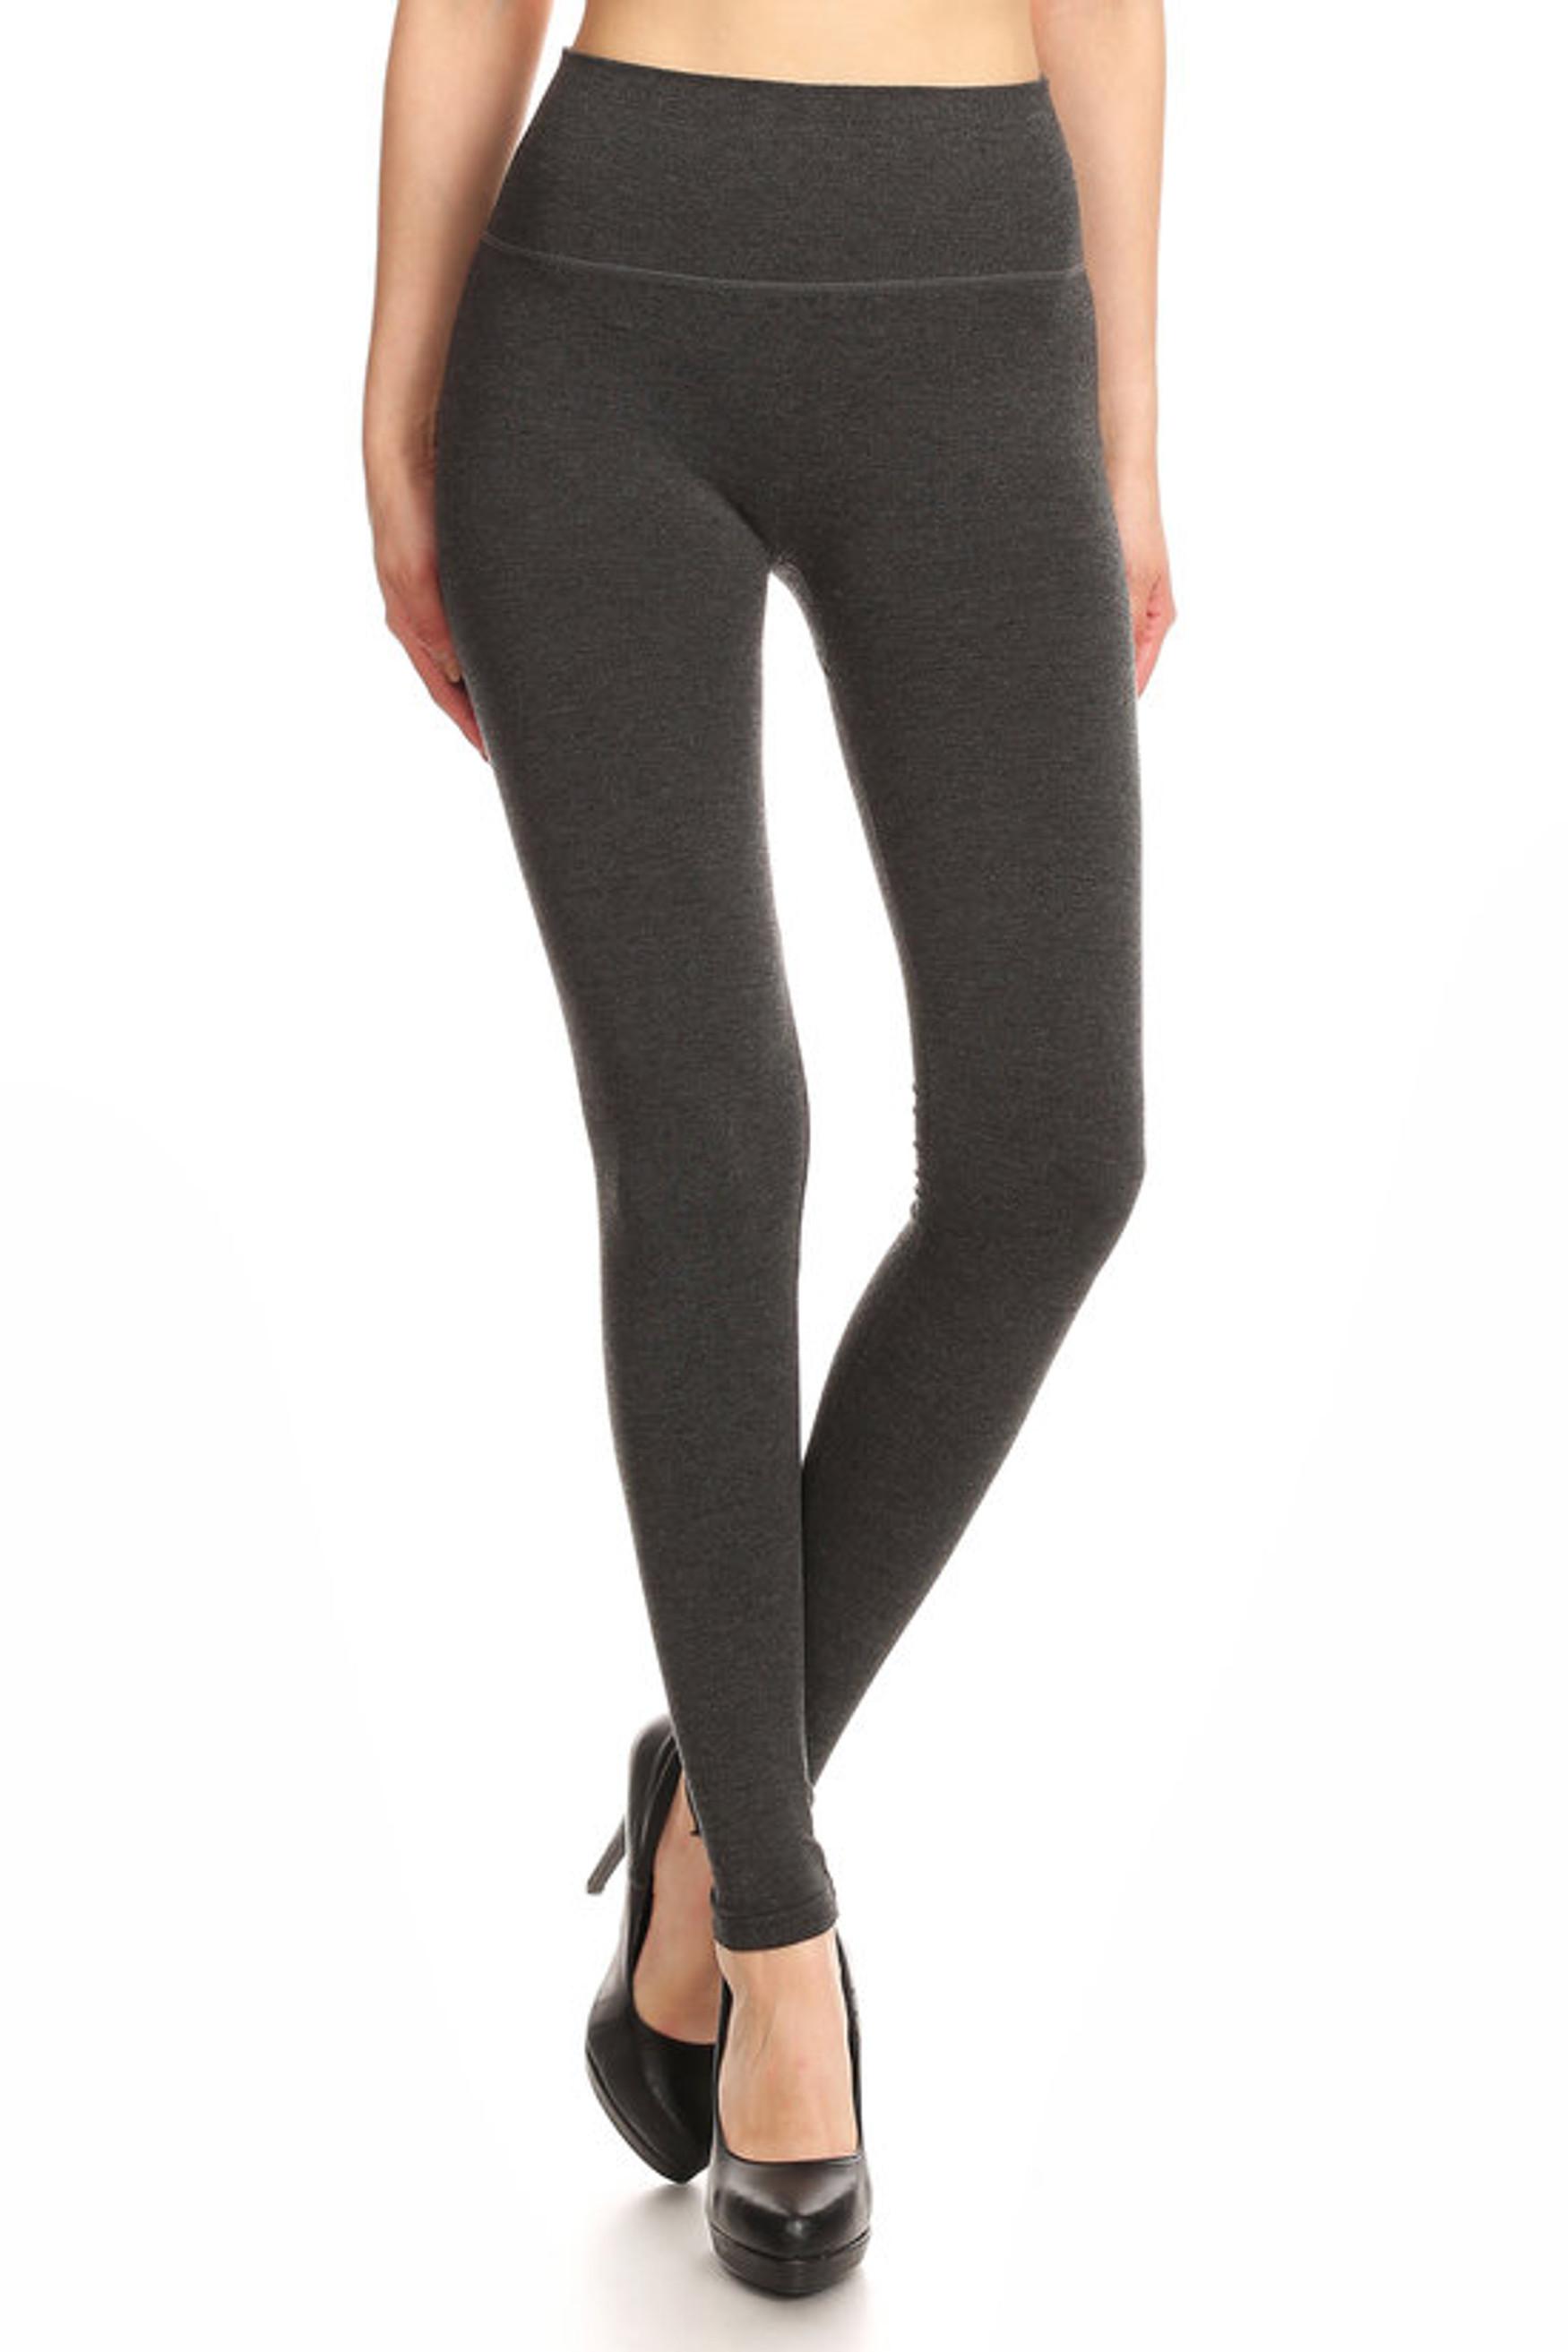 Charcoal Premium High Waisted Basic Leggings